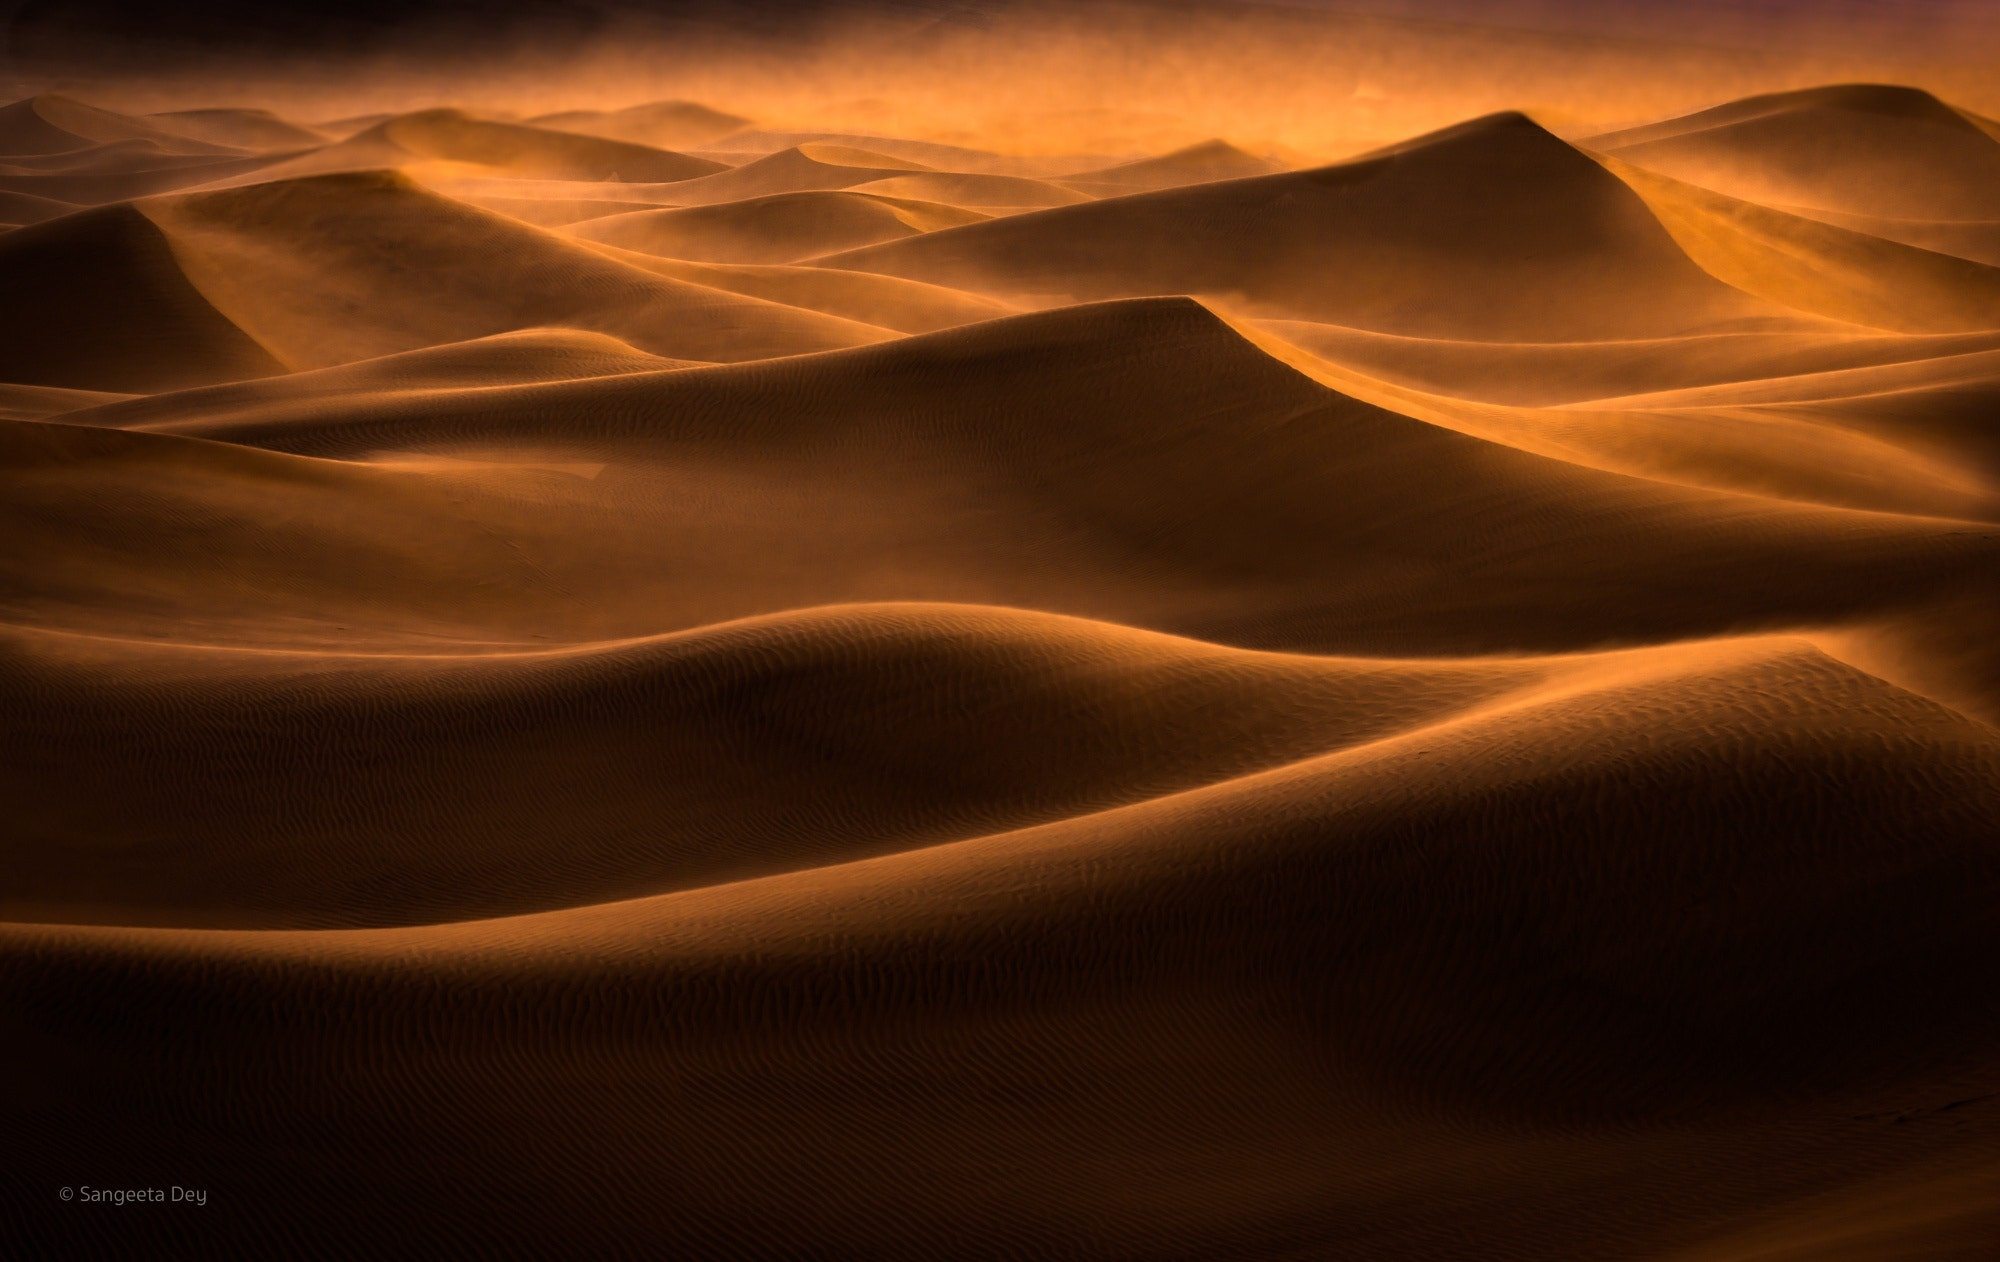 барханы пустыня дюны  № 1291907 бесплатно